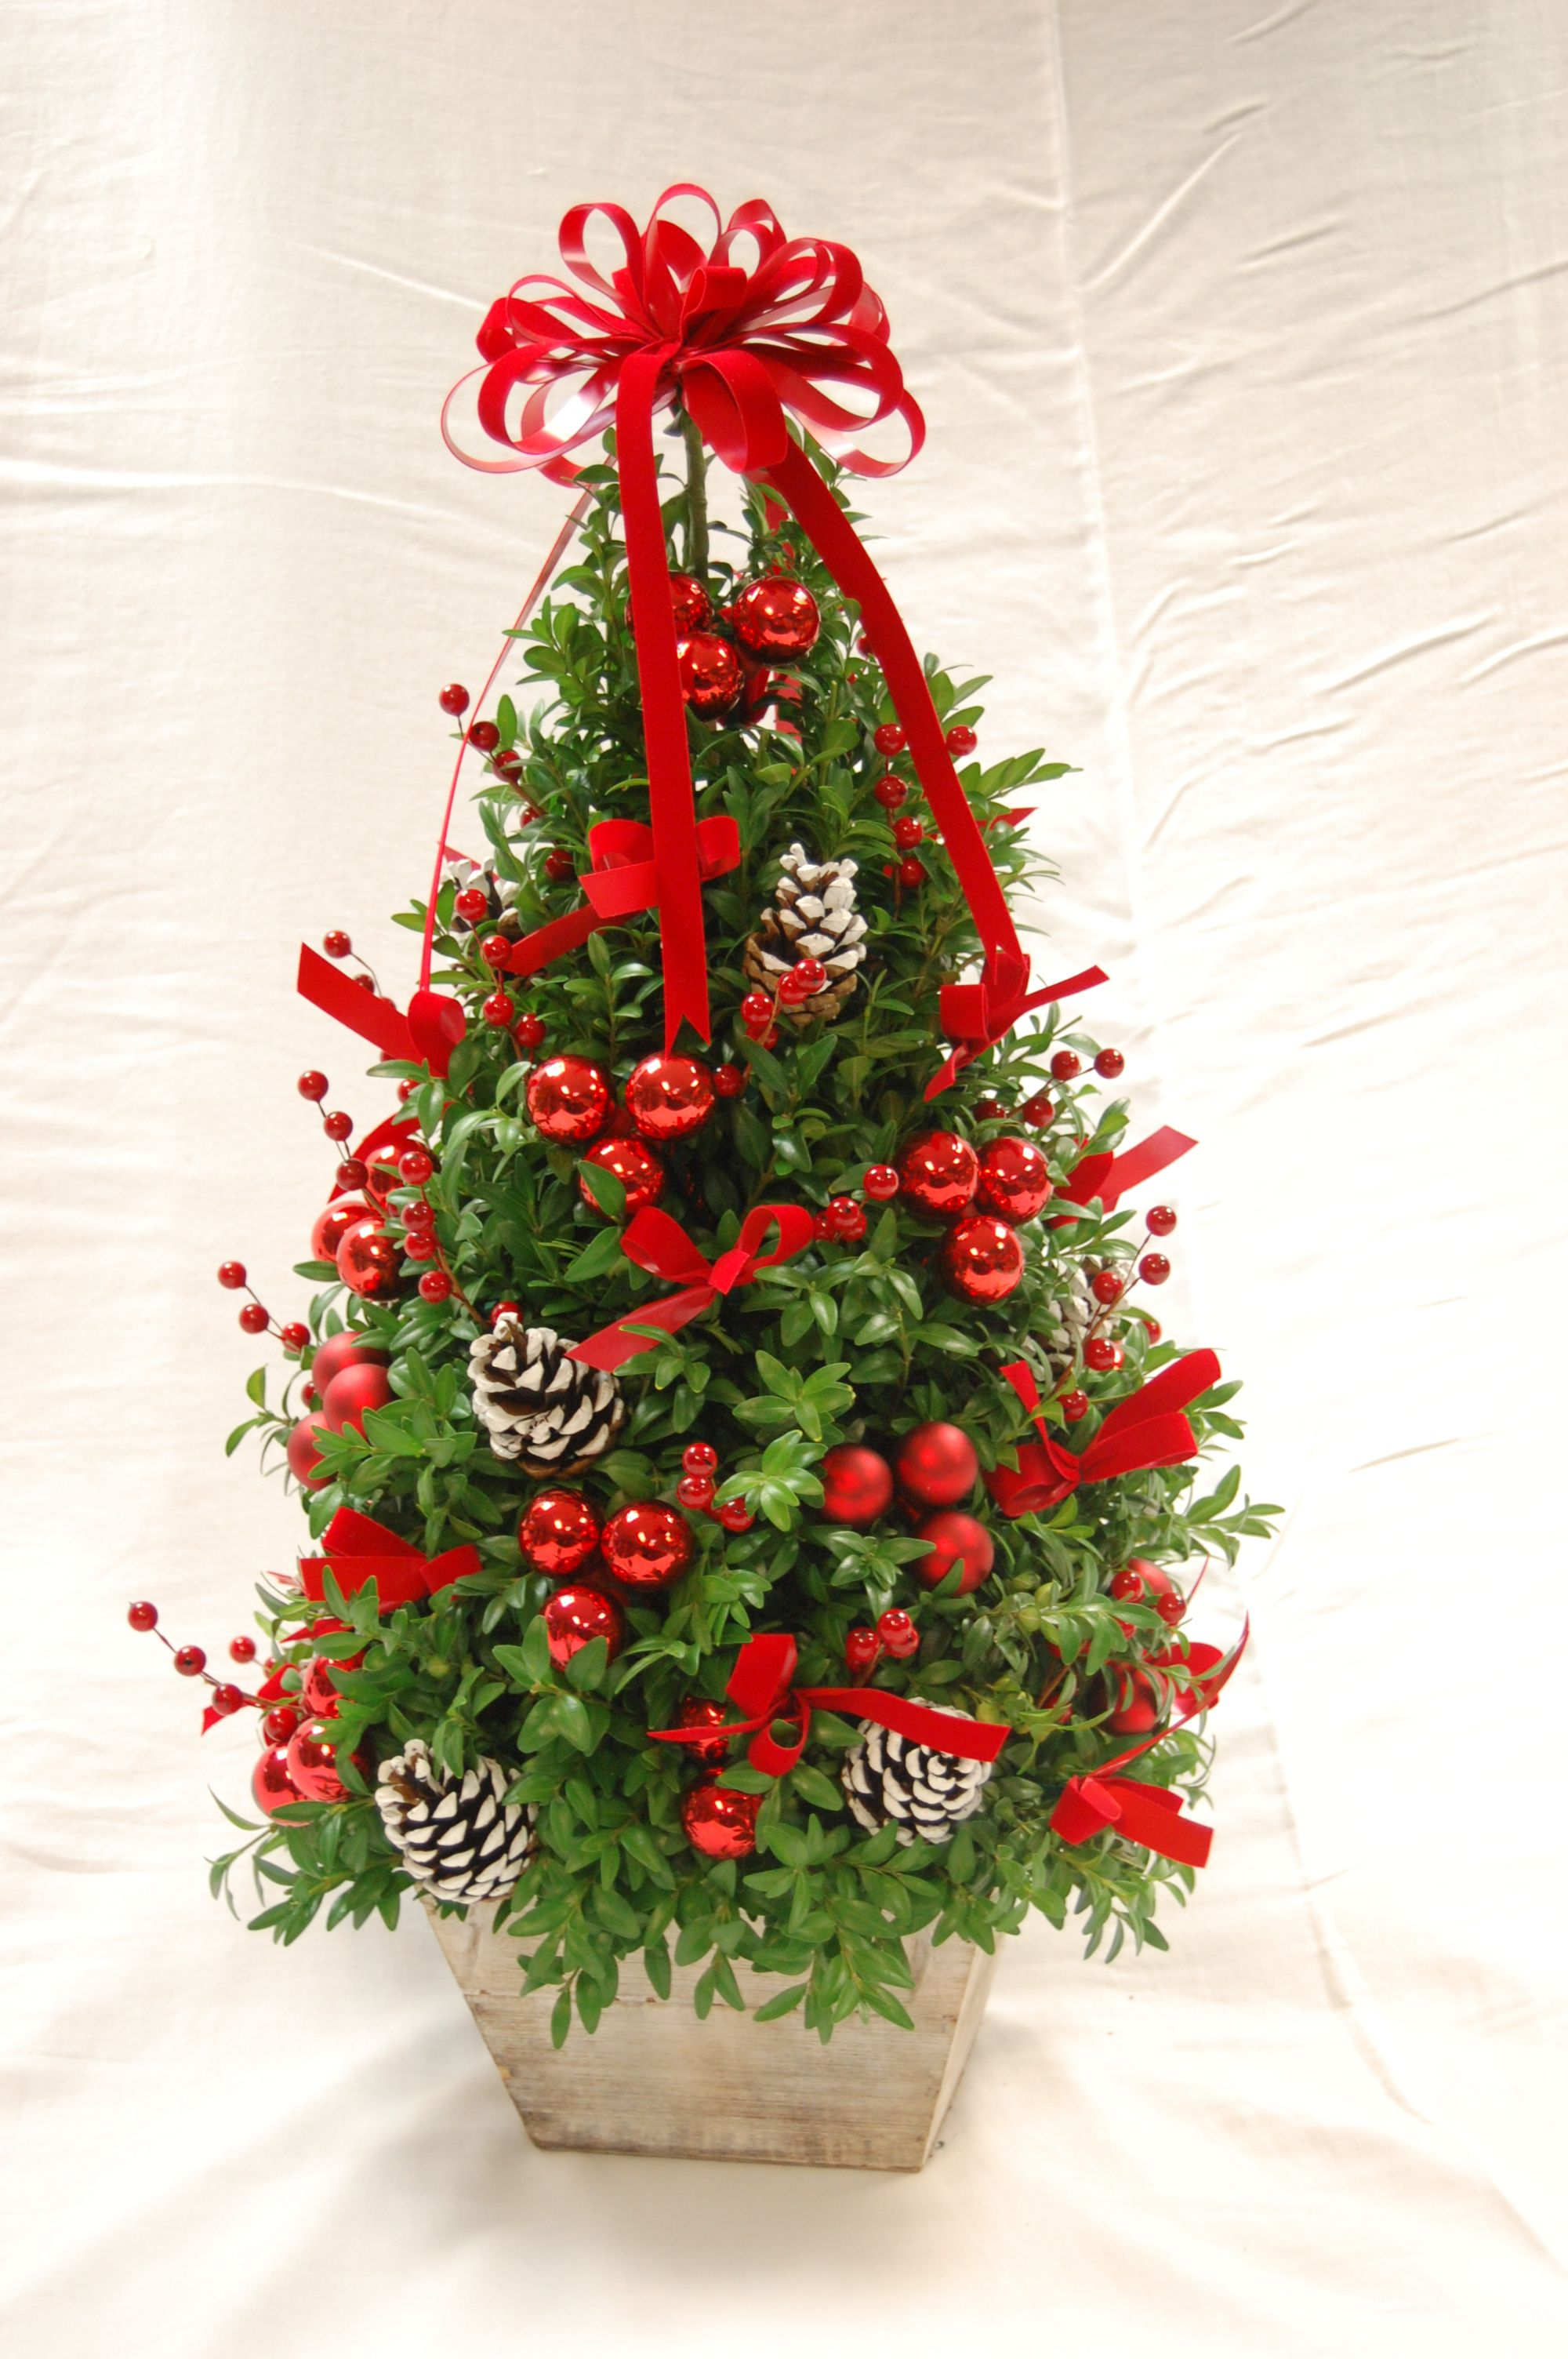 A Boxwood Christmas Tree Christmas Flower Arrangements Christmas Arrangements Christmas Centerpieces